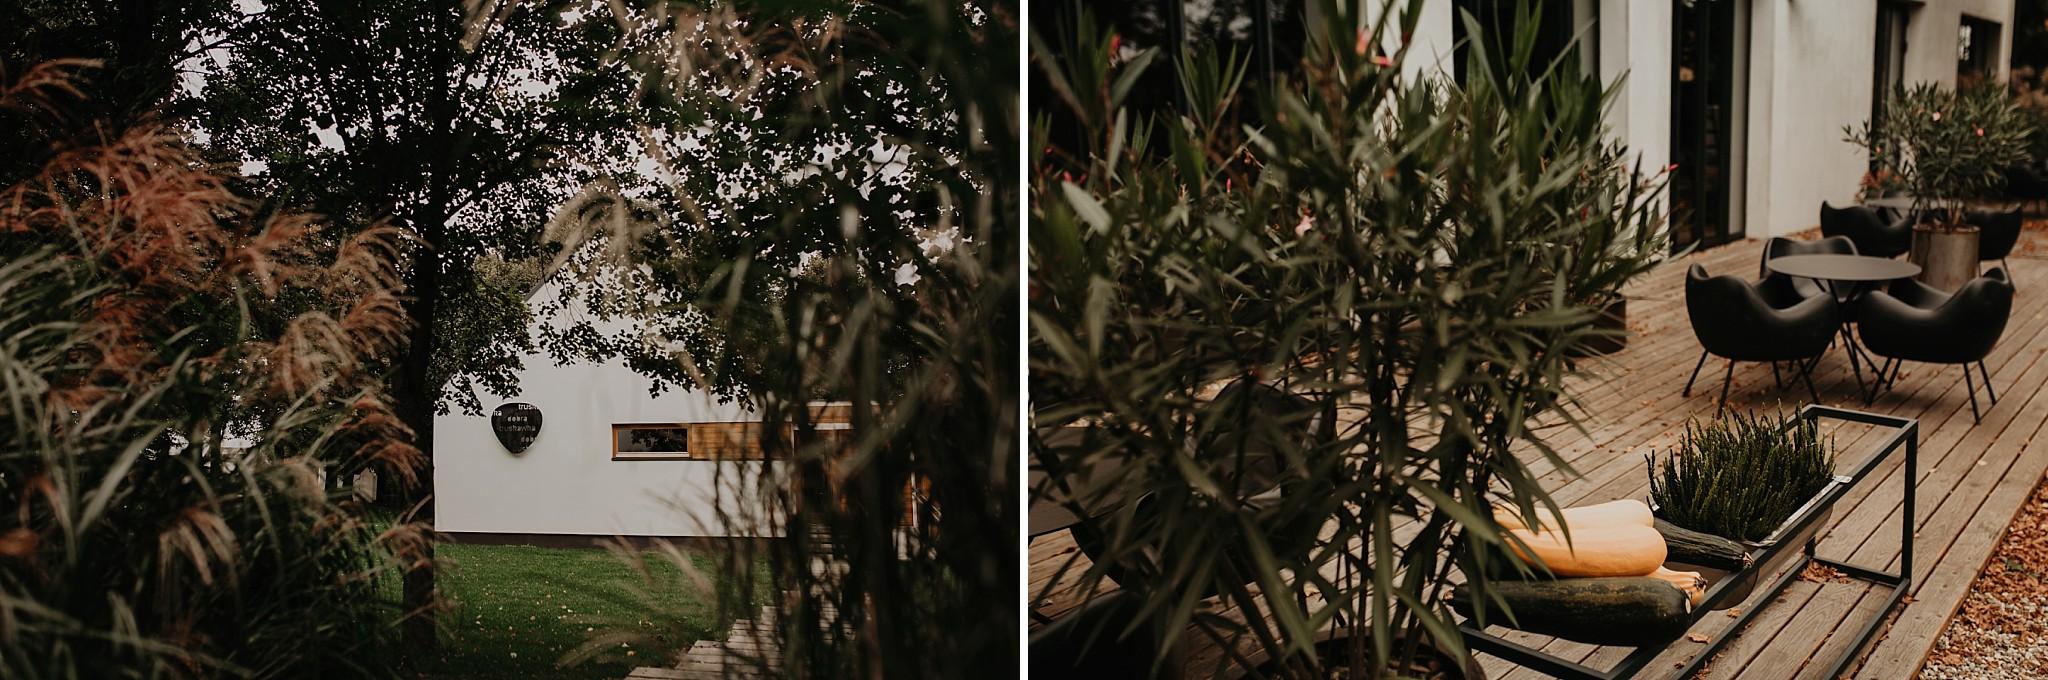 fotograf poznan wesele dobra truskawka piekne wesele pod poznaniem wesele w dobrej truskawce piekna para mloda slub marzen slub koronawirus slub listopad wesele koronawirus 003